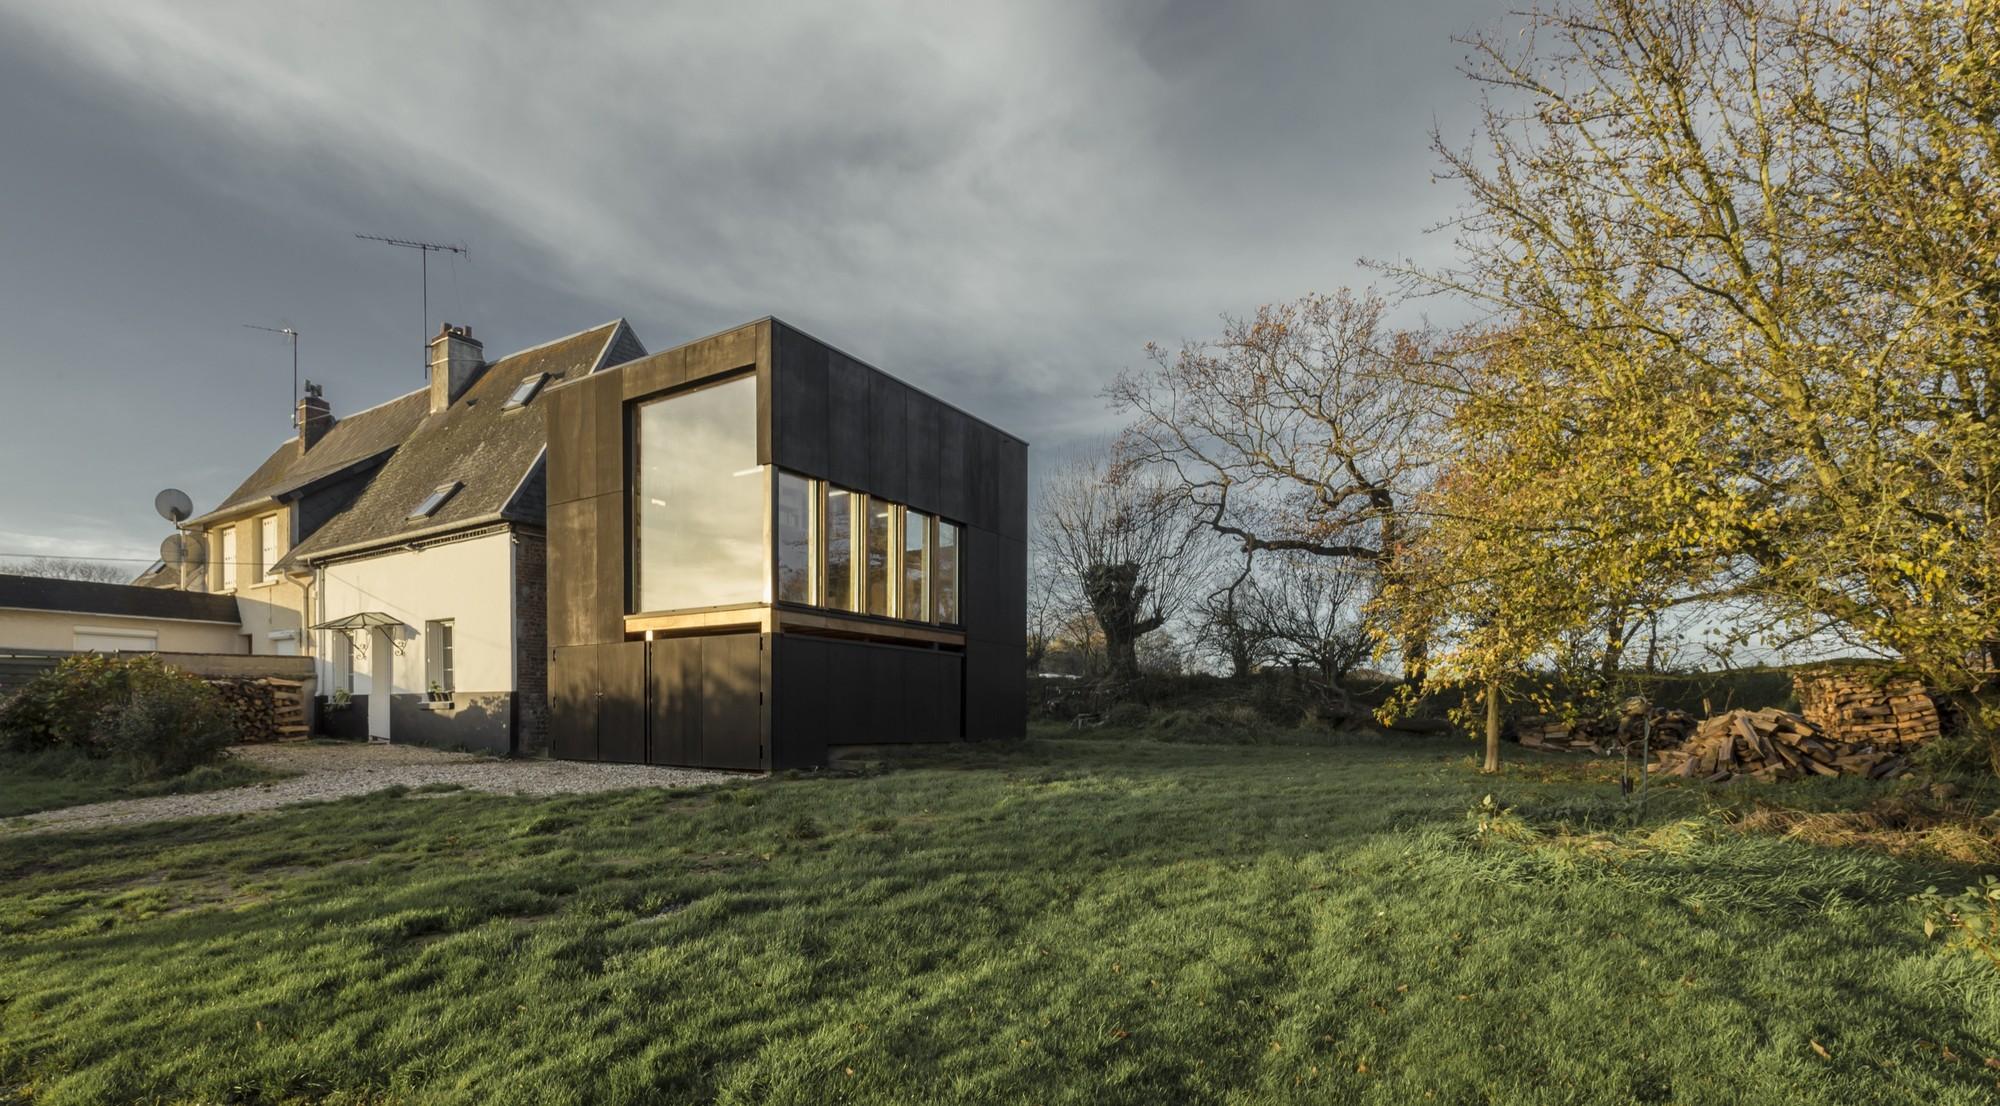 cliffs impasse ziegler antonin architecte archdaily colombia. Black Bedroom Furniture Sets. Home Design Ideas